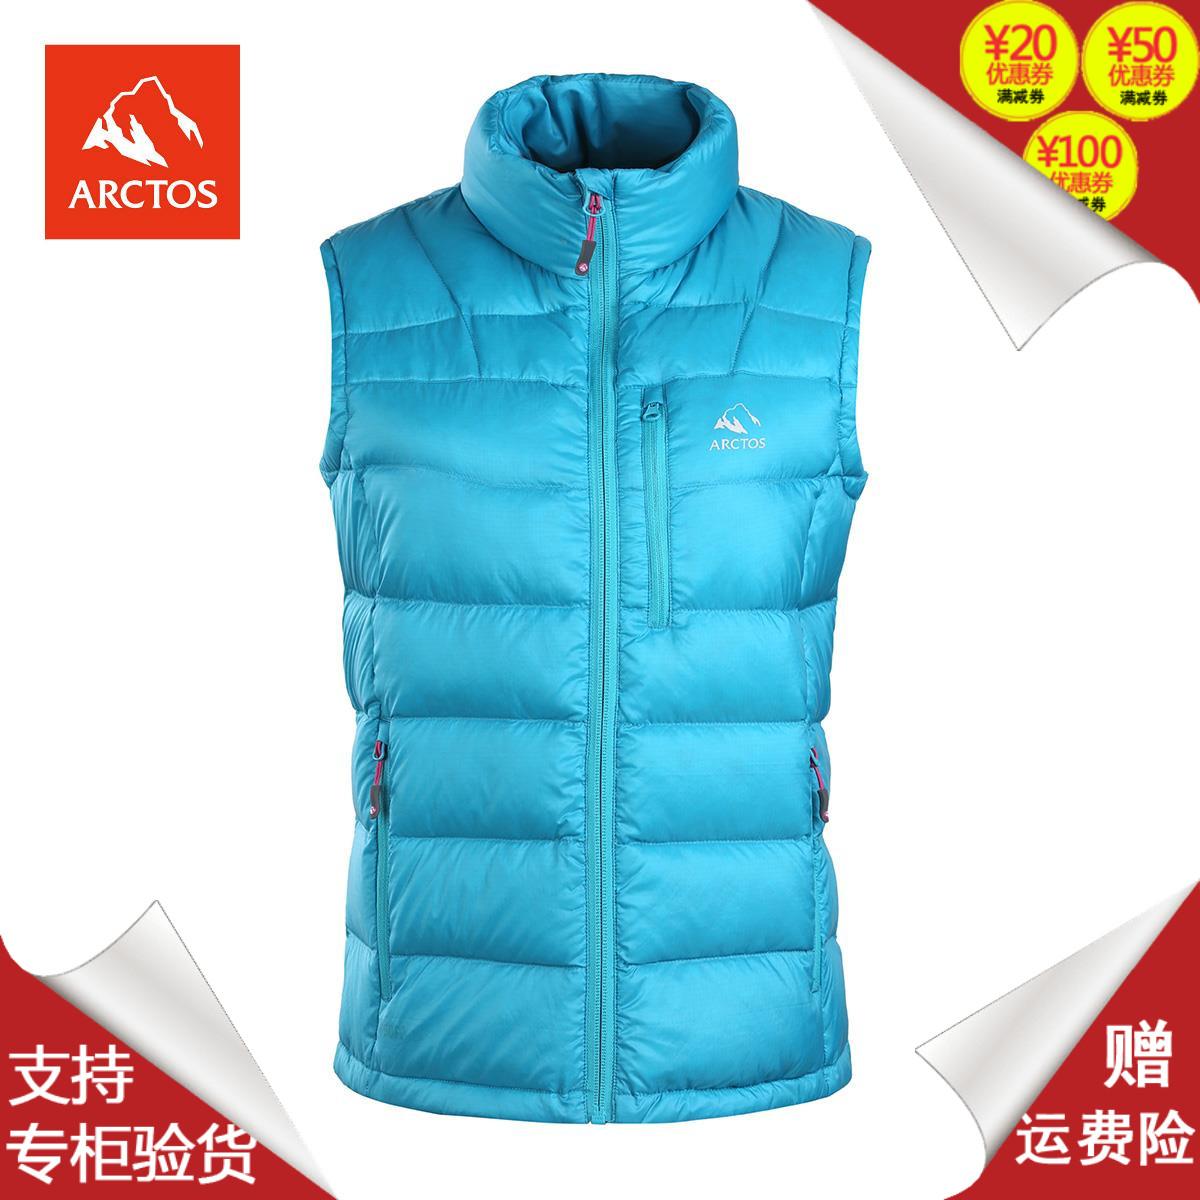 Arctos breathable warm 90% white duck down autumn and winter light short  paragraph ladies polar 4c4f12a94